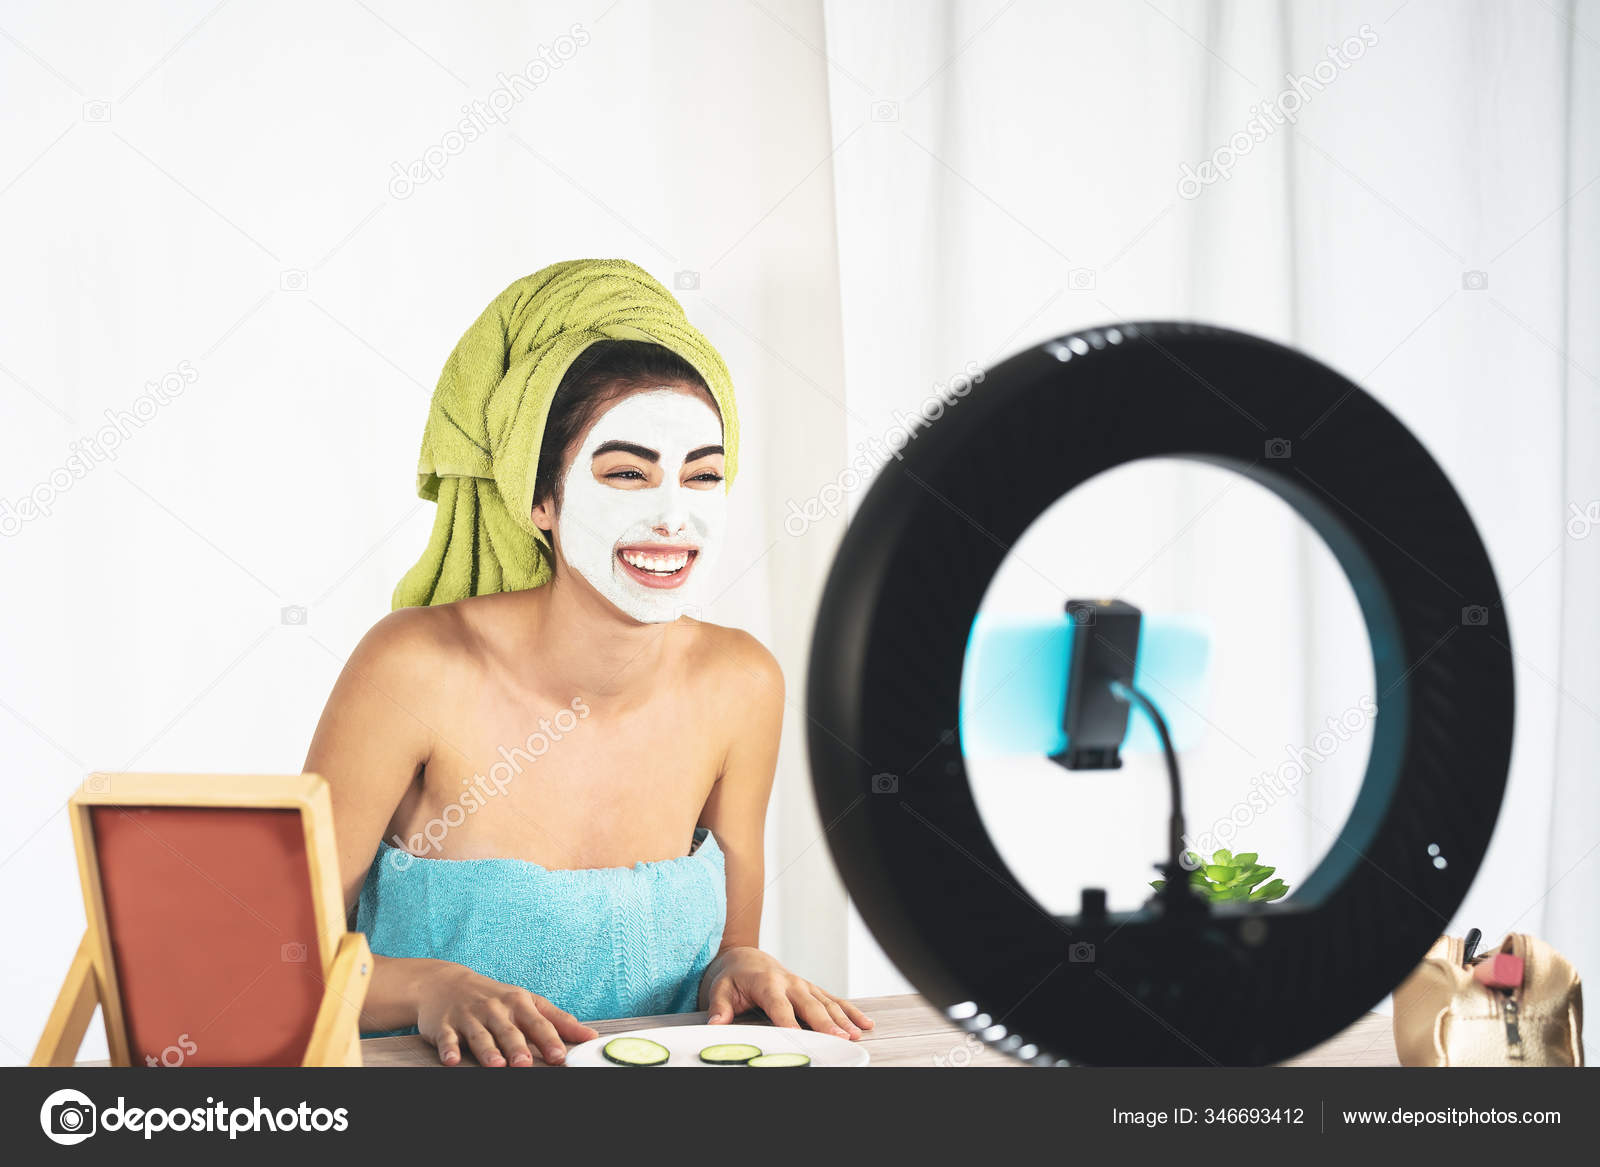 Young Female Vlogger Applying Skincare Facial Mask While Recording Video Stock Photo C Alessandrobiascioli 346693412